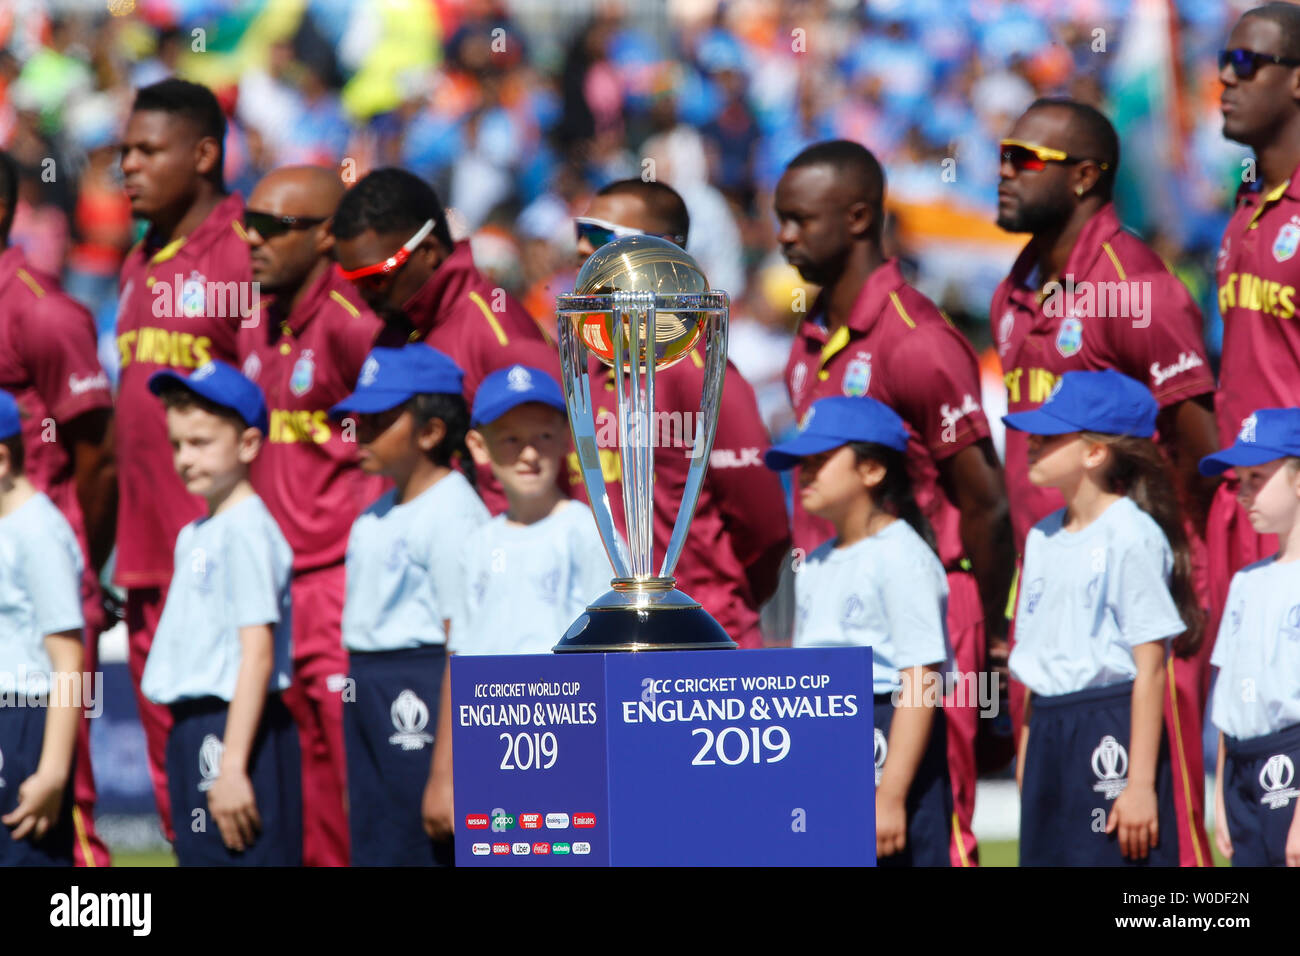 India National Cricket Team Stock Photos & India National Cricket